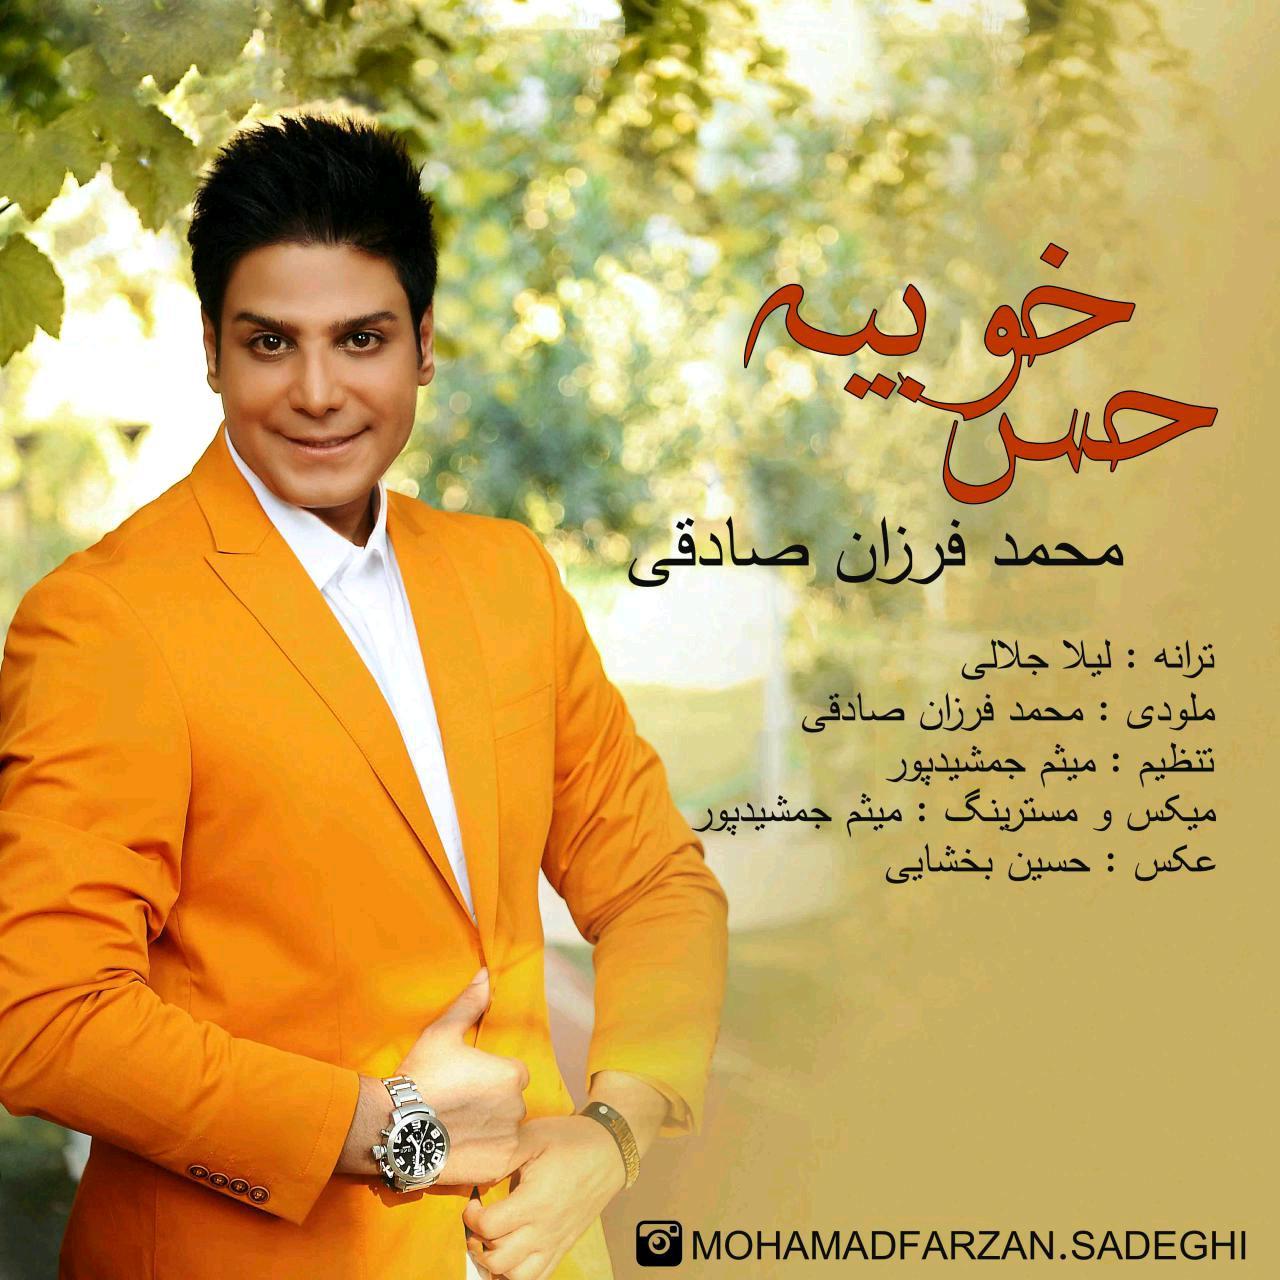 Mohamad Farzan Sadeghi – Hese Khobiye